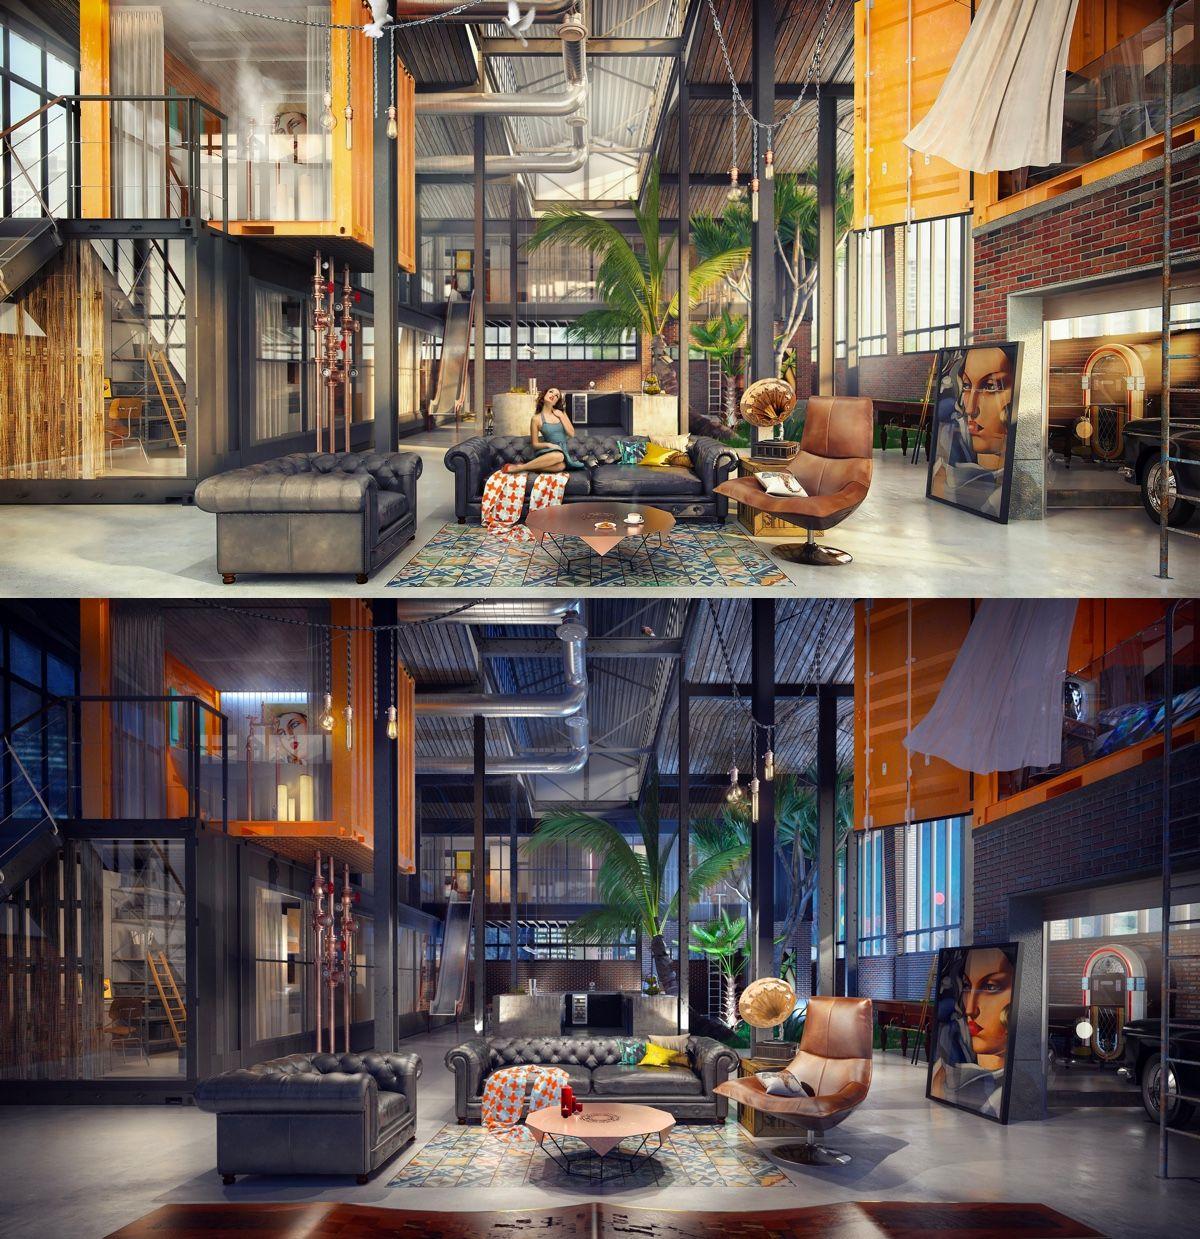 Industrial Loft: Loft Living Room Design With Modern Industrial Style